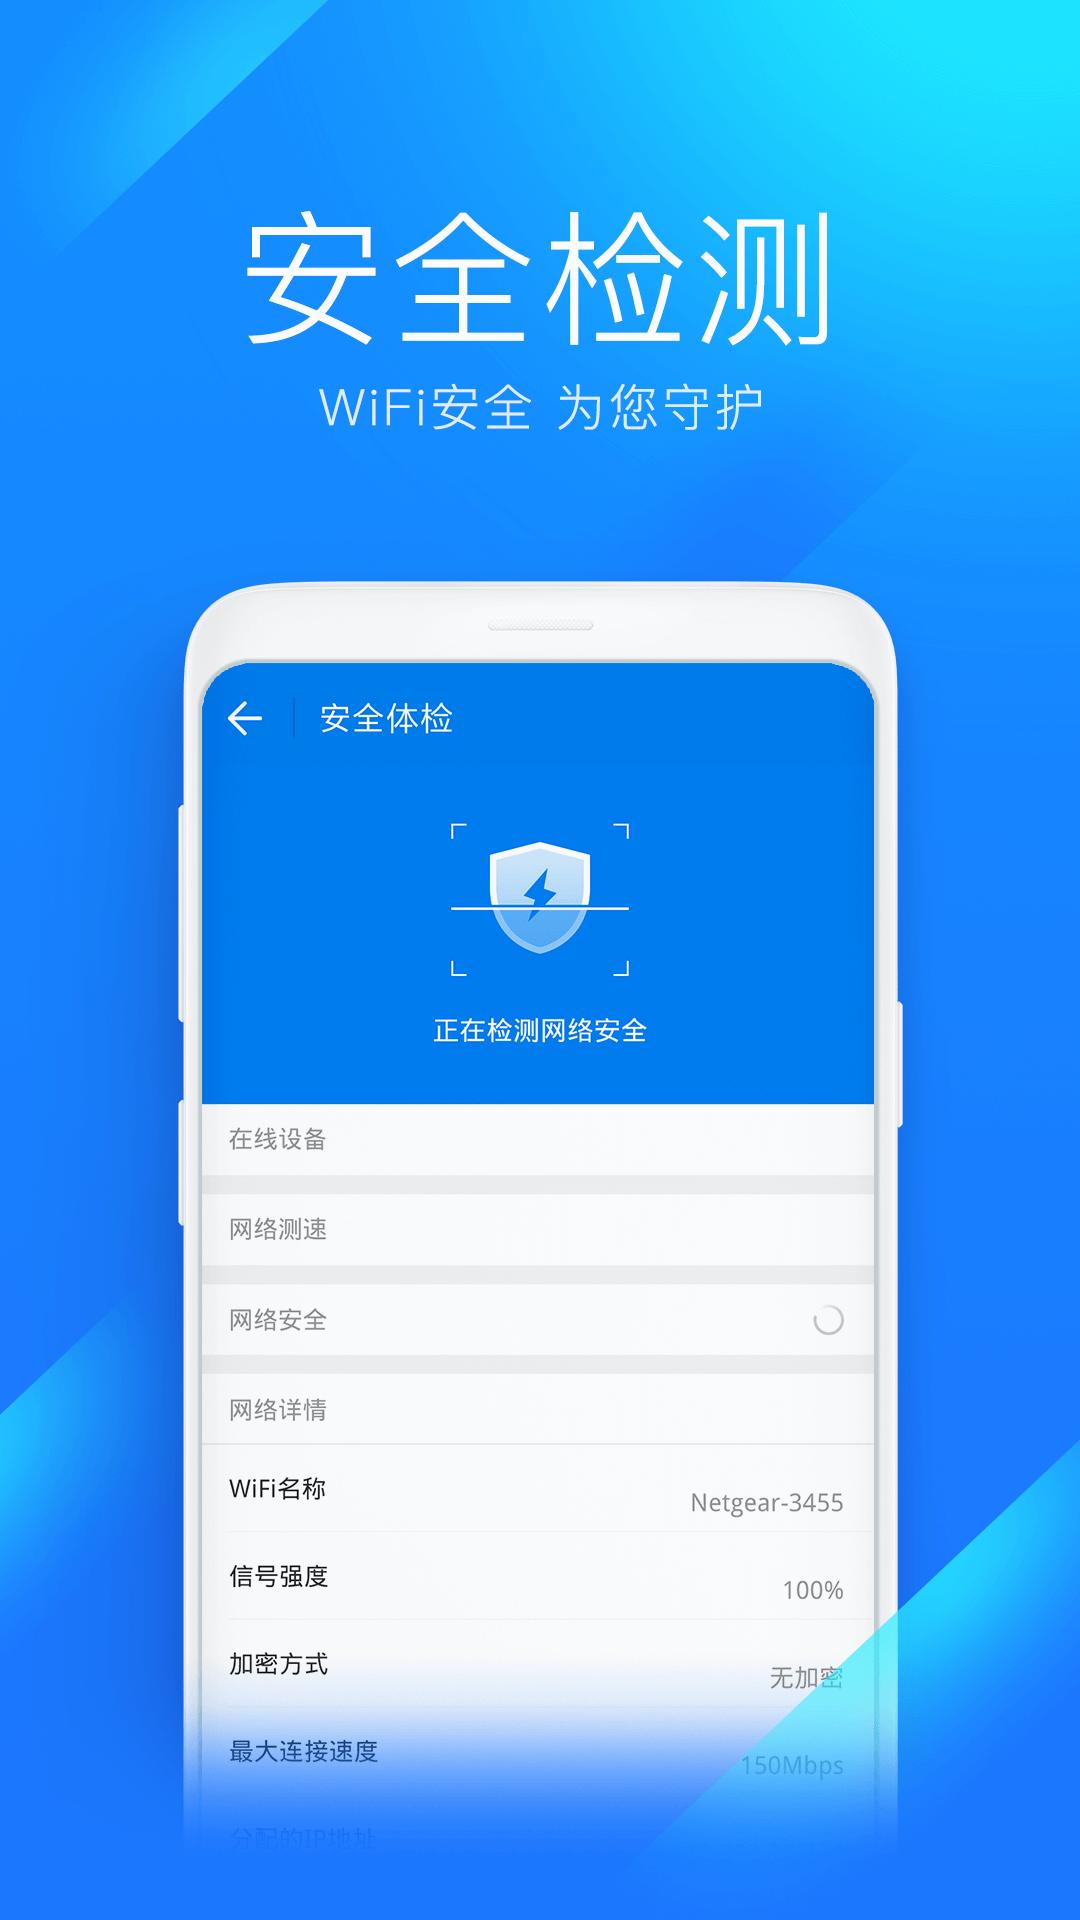 WiFi万能钥匙下载官方免费下载